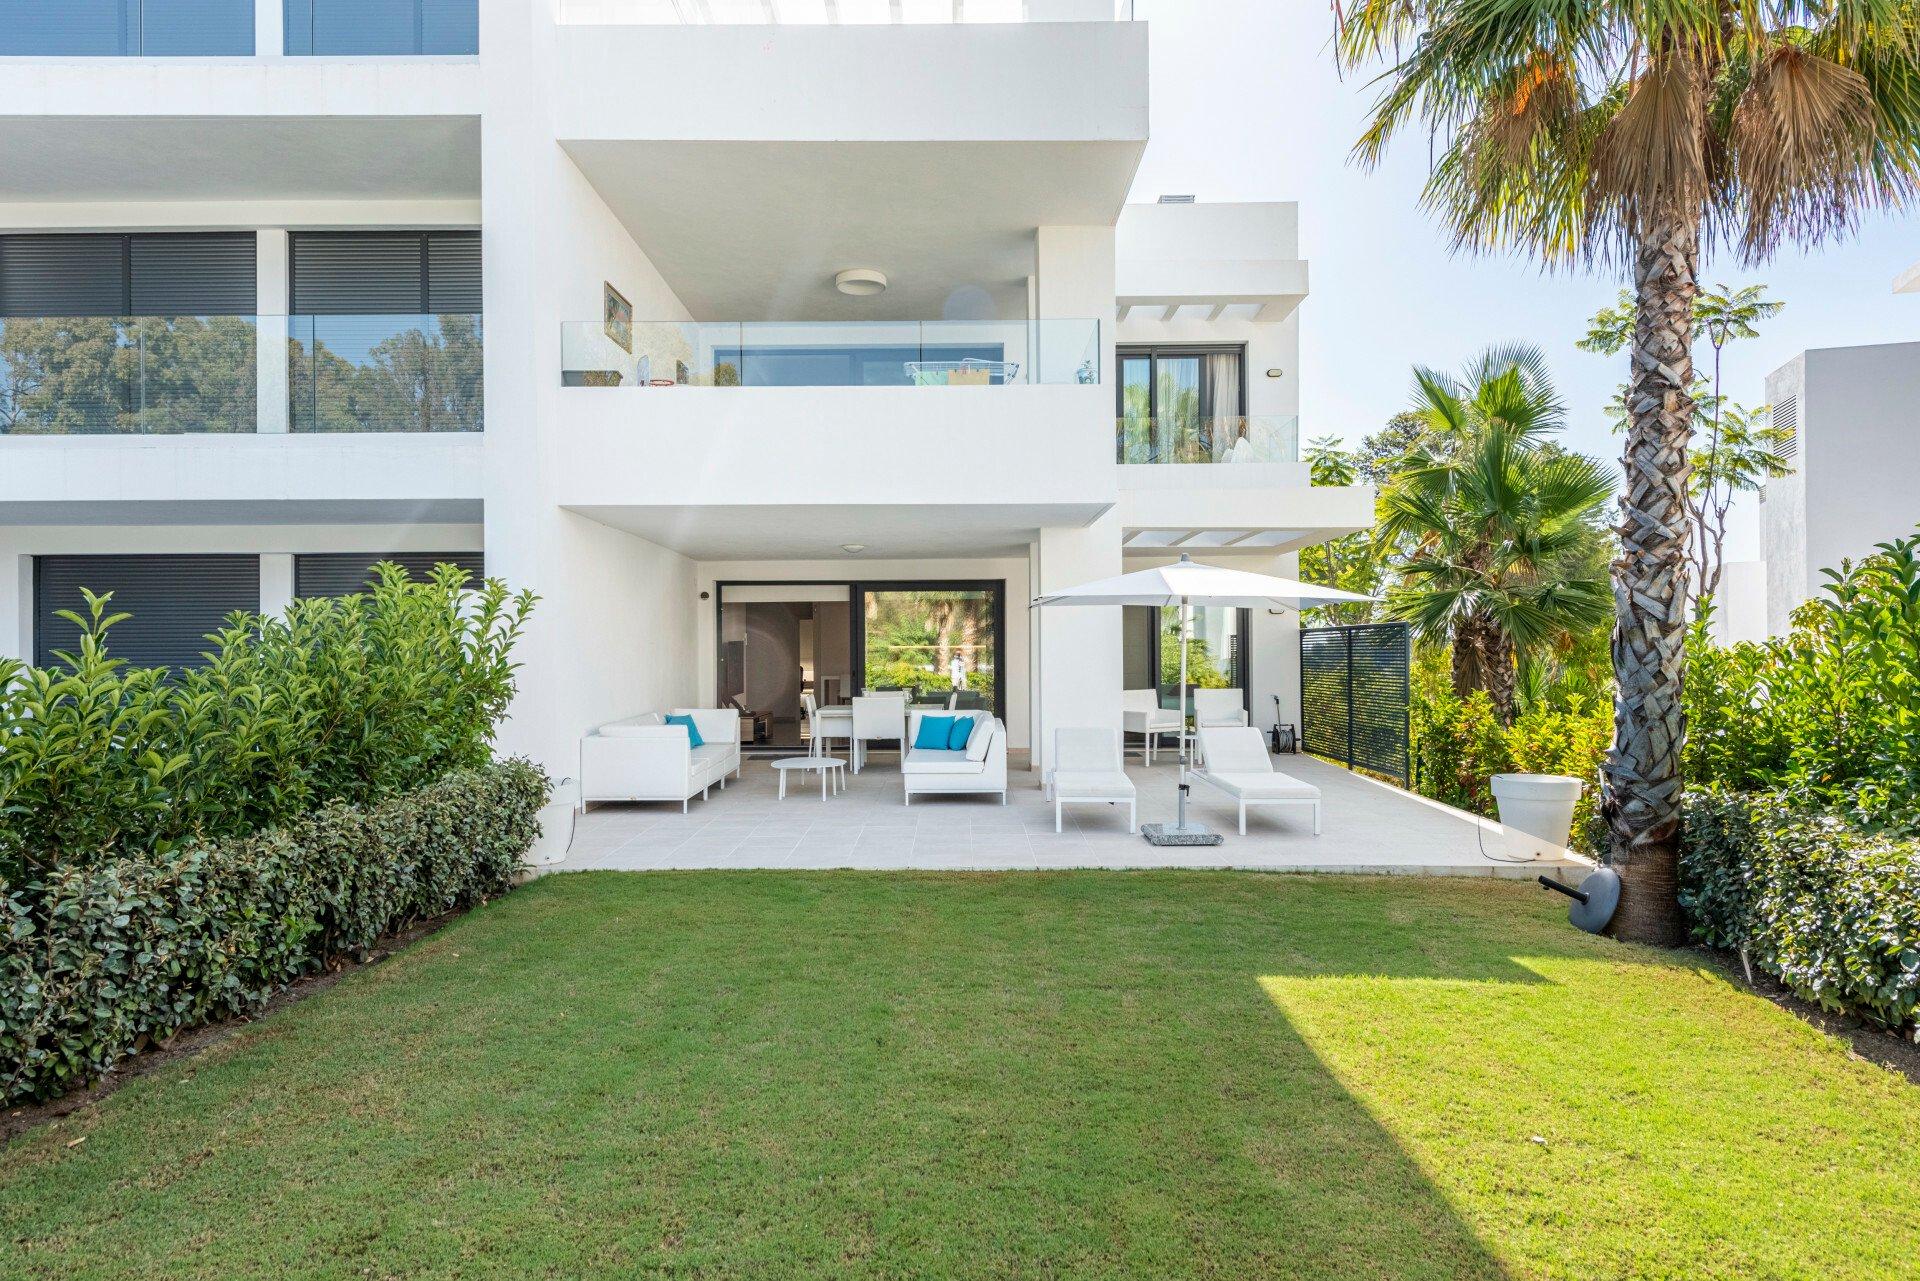 Apartment in Estepona, Andalusia, Spain 1 - 11058733